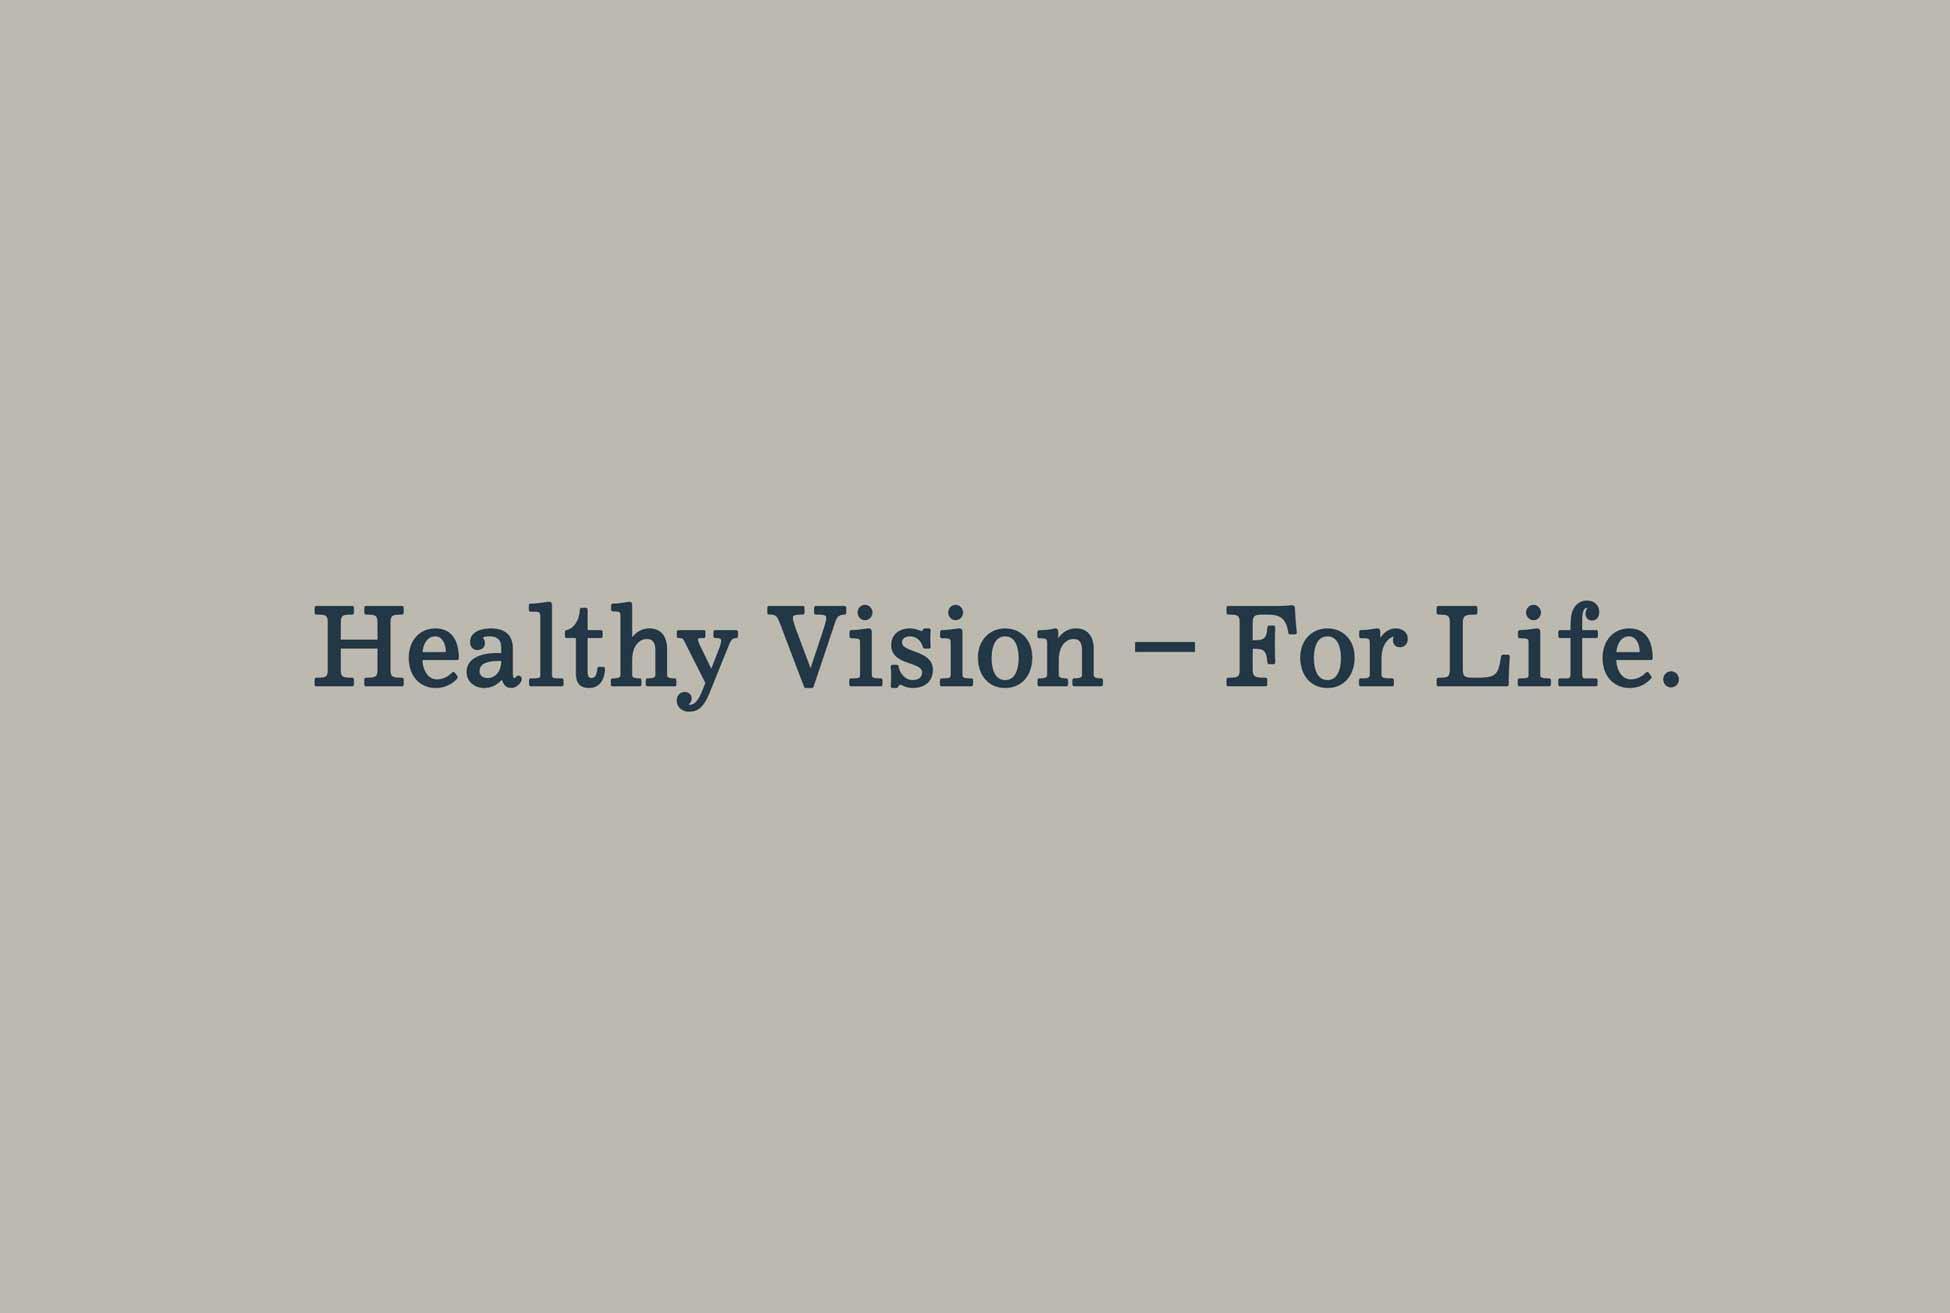 eyetoeye_healthy-vision-for-life-2.jpg